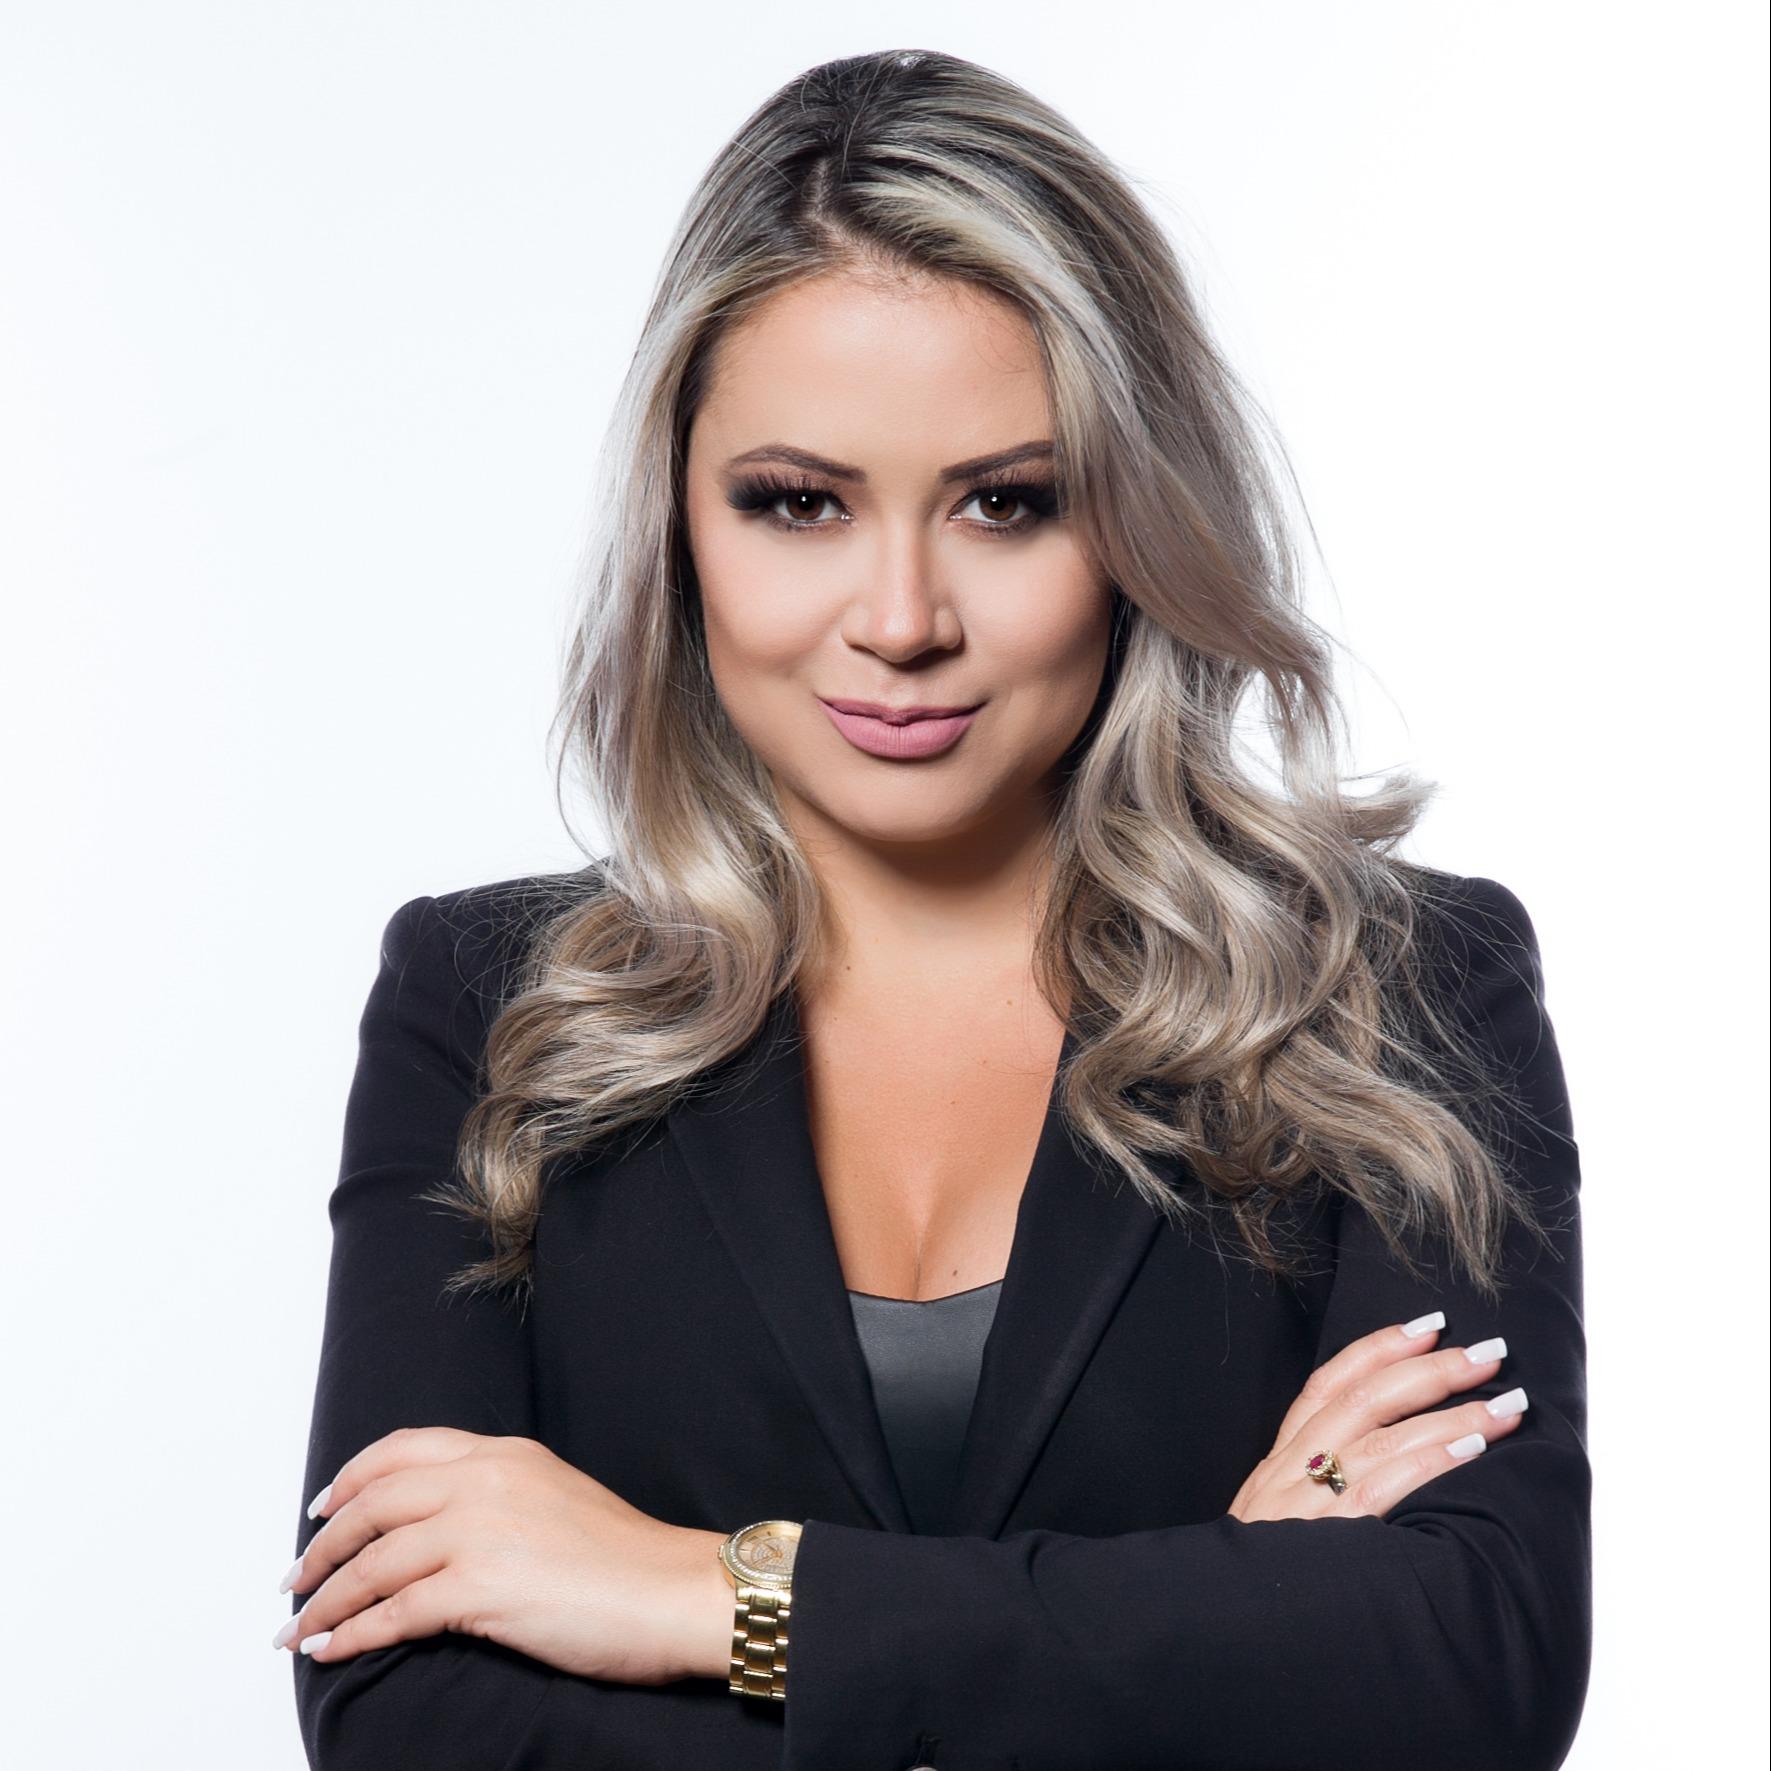 @advjulianasouza Profile Image | Linktree